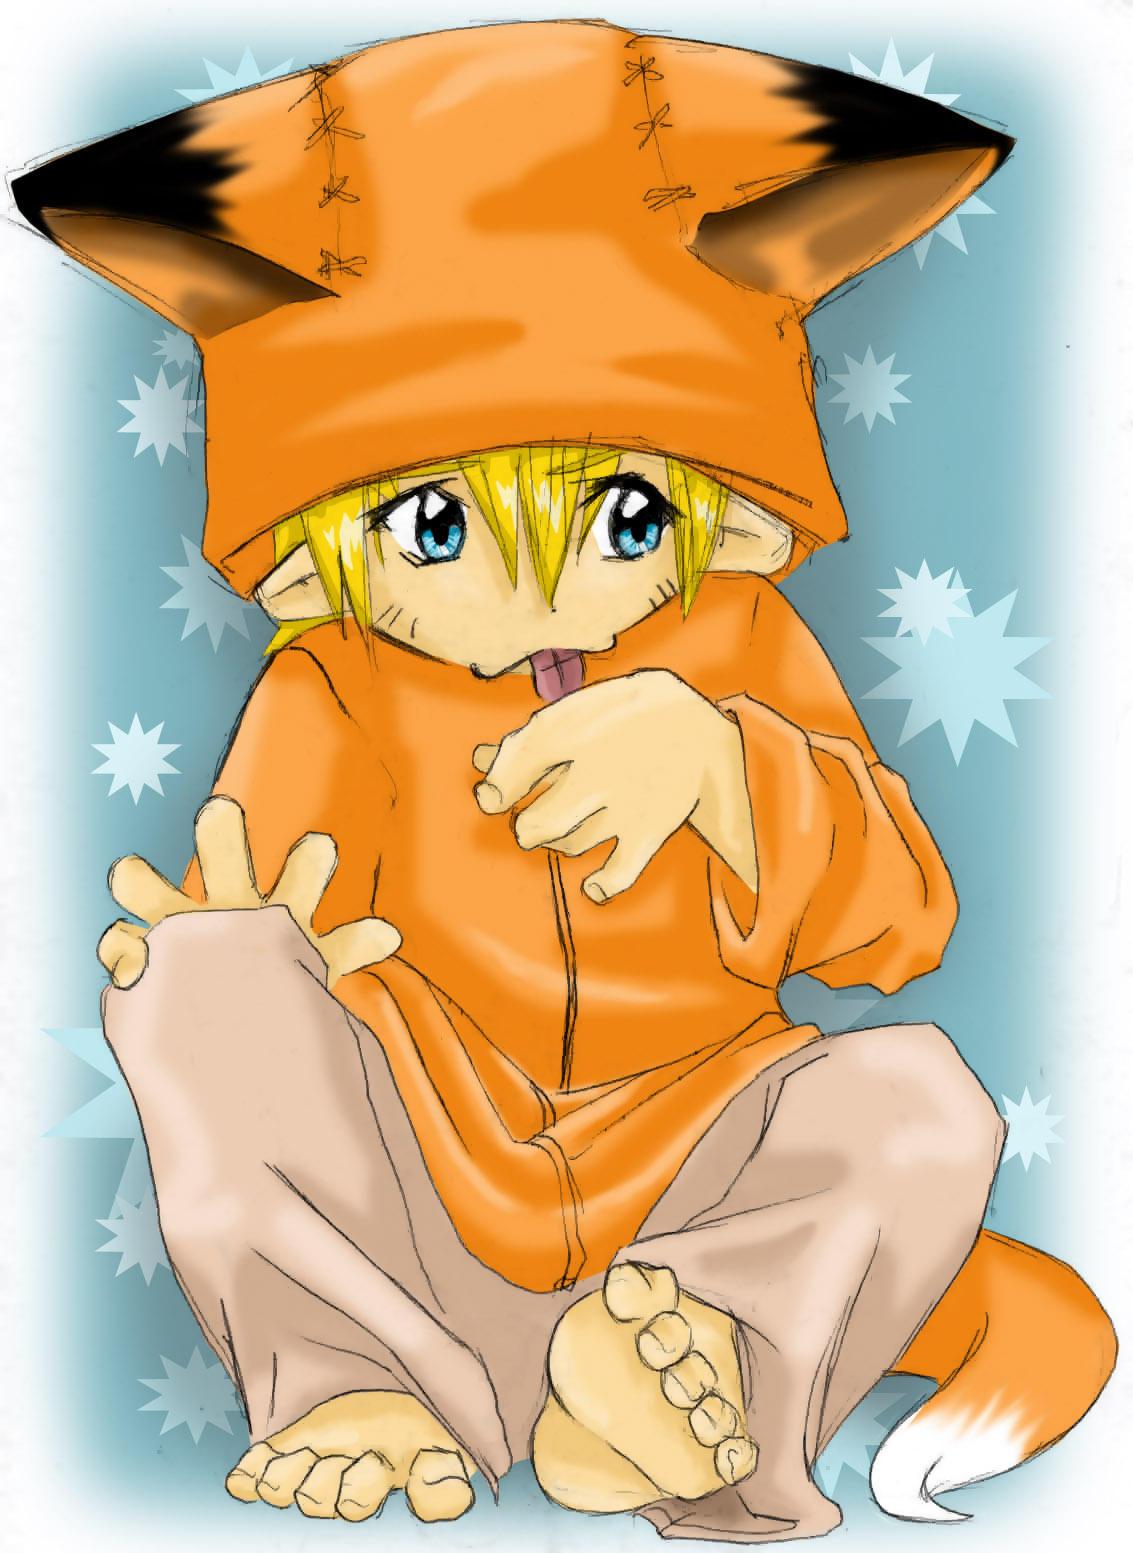 http://fc08.deviantart.com/fs4/i/2004/208/c/1/Chibi_Naruto.jpg